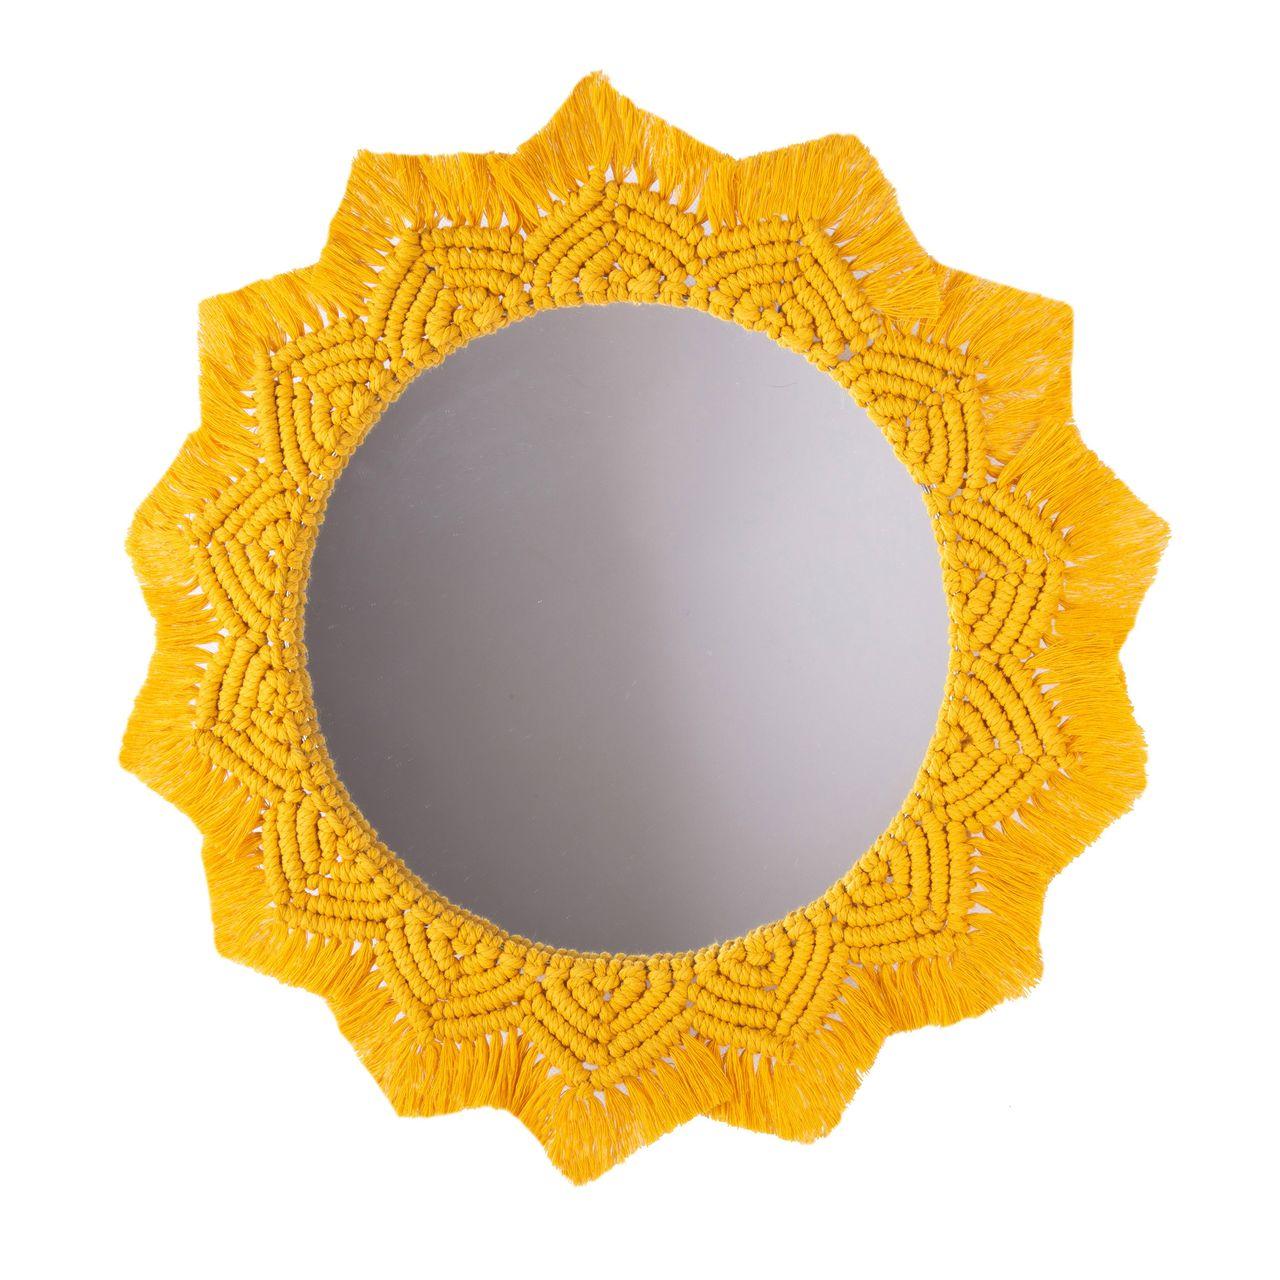 آینه مدل خورشید کد zhi11